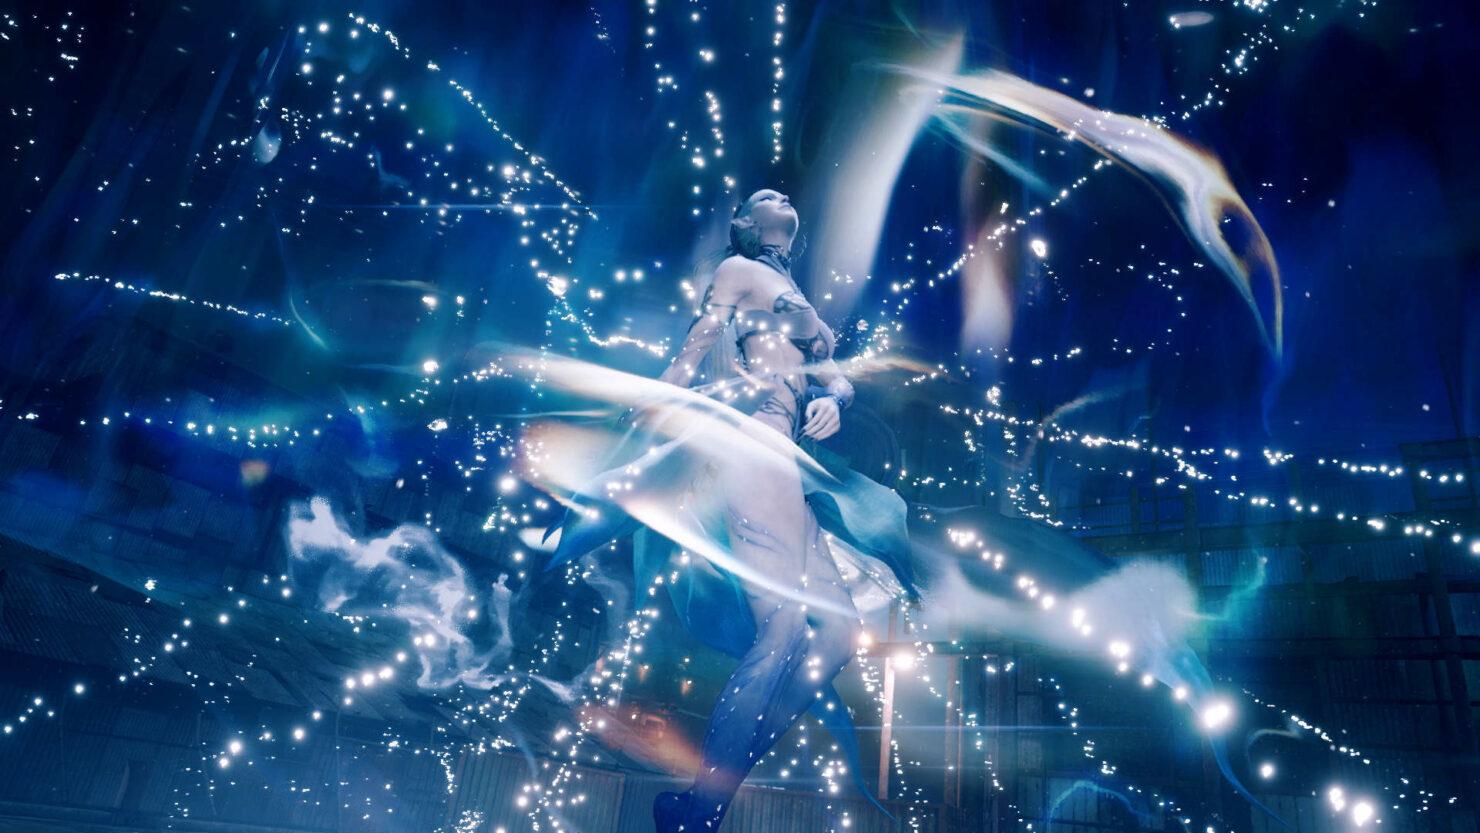 final-fantasy-vii-remake-screenshots-info-40987